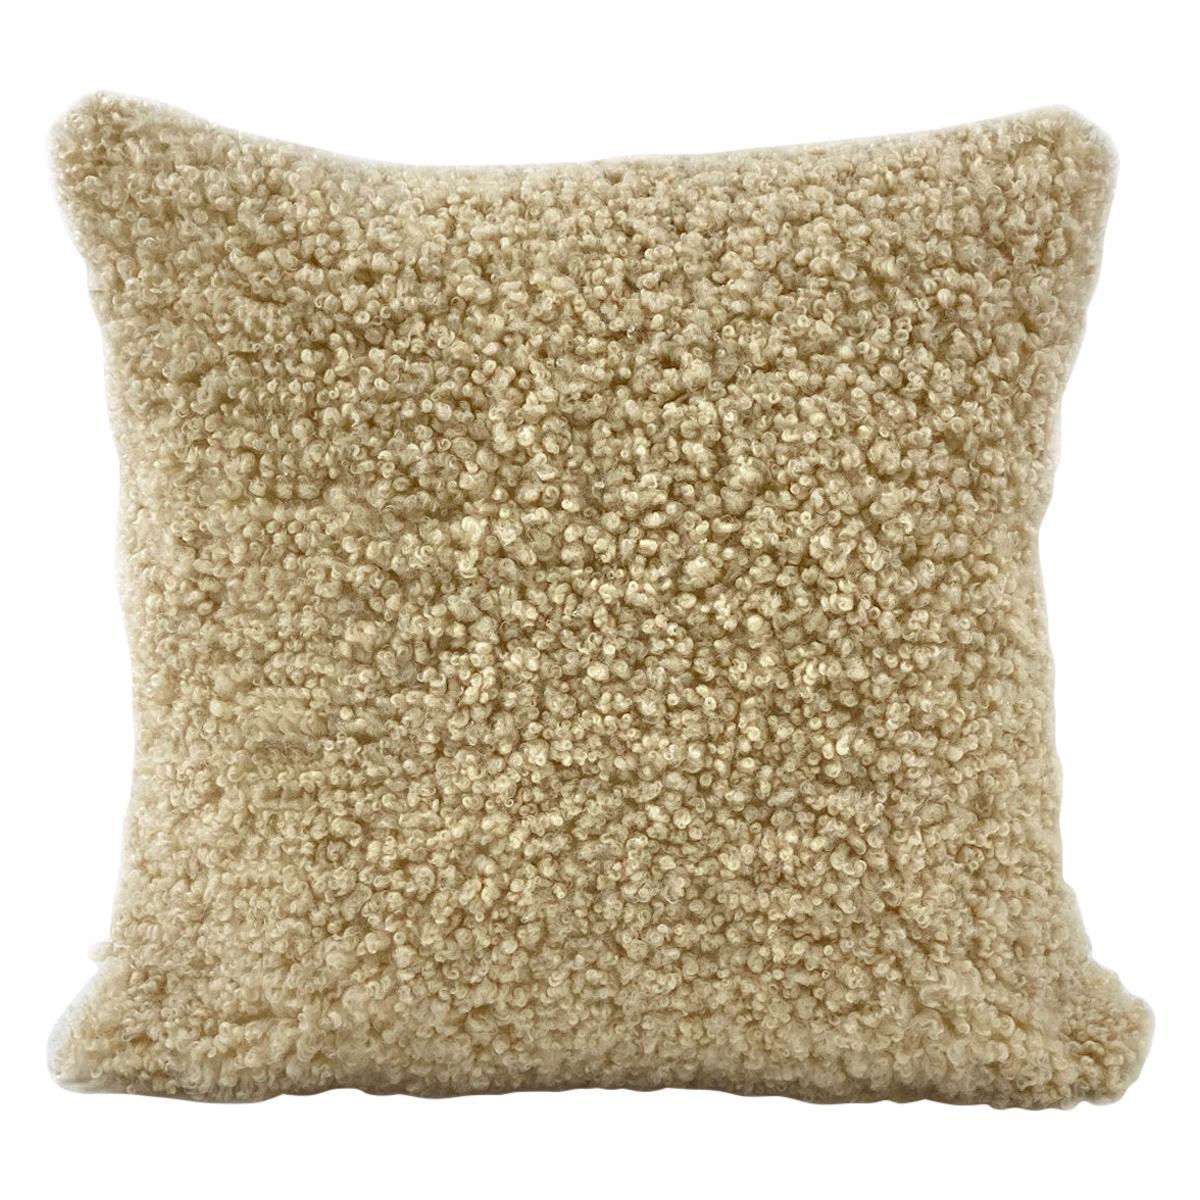 "Shearling Sheepskin Pillow Dark Linen - 18x18"" / 45x45cm"